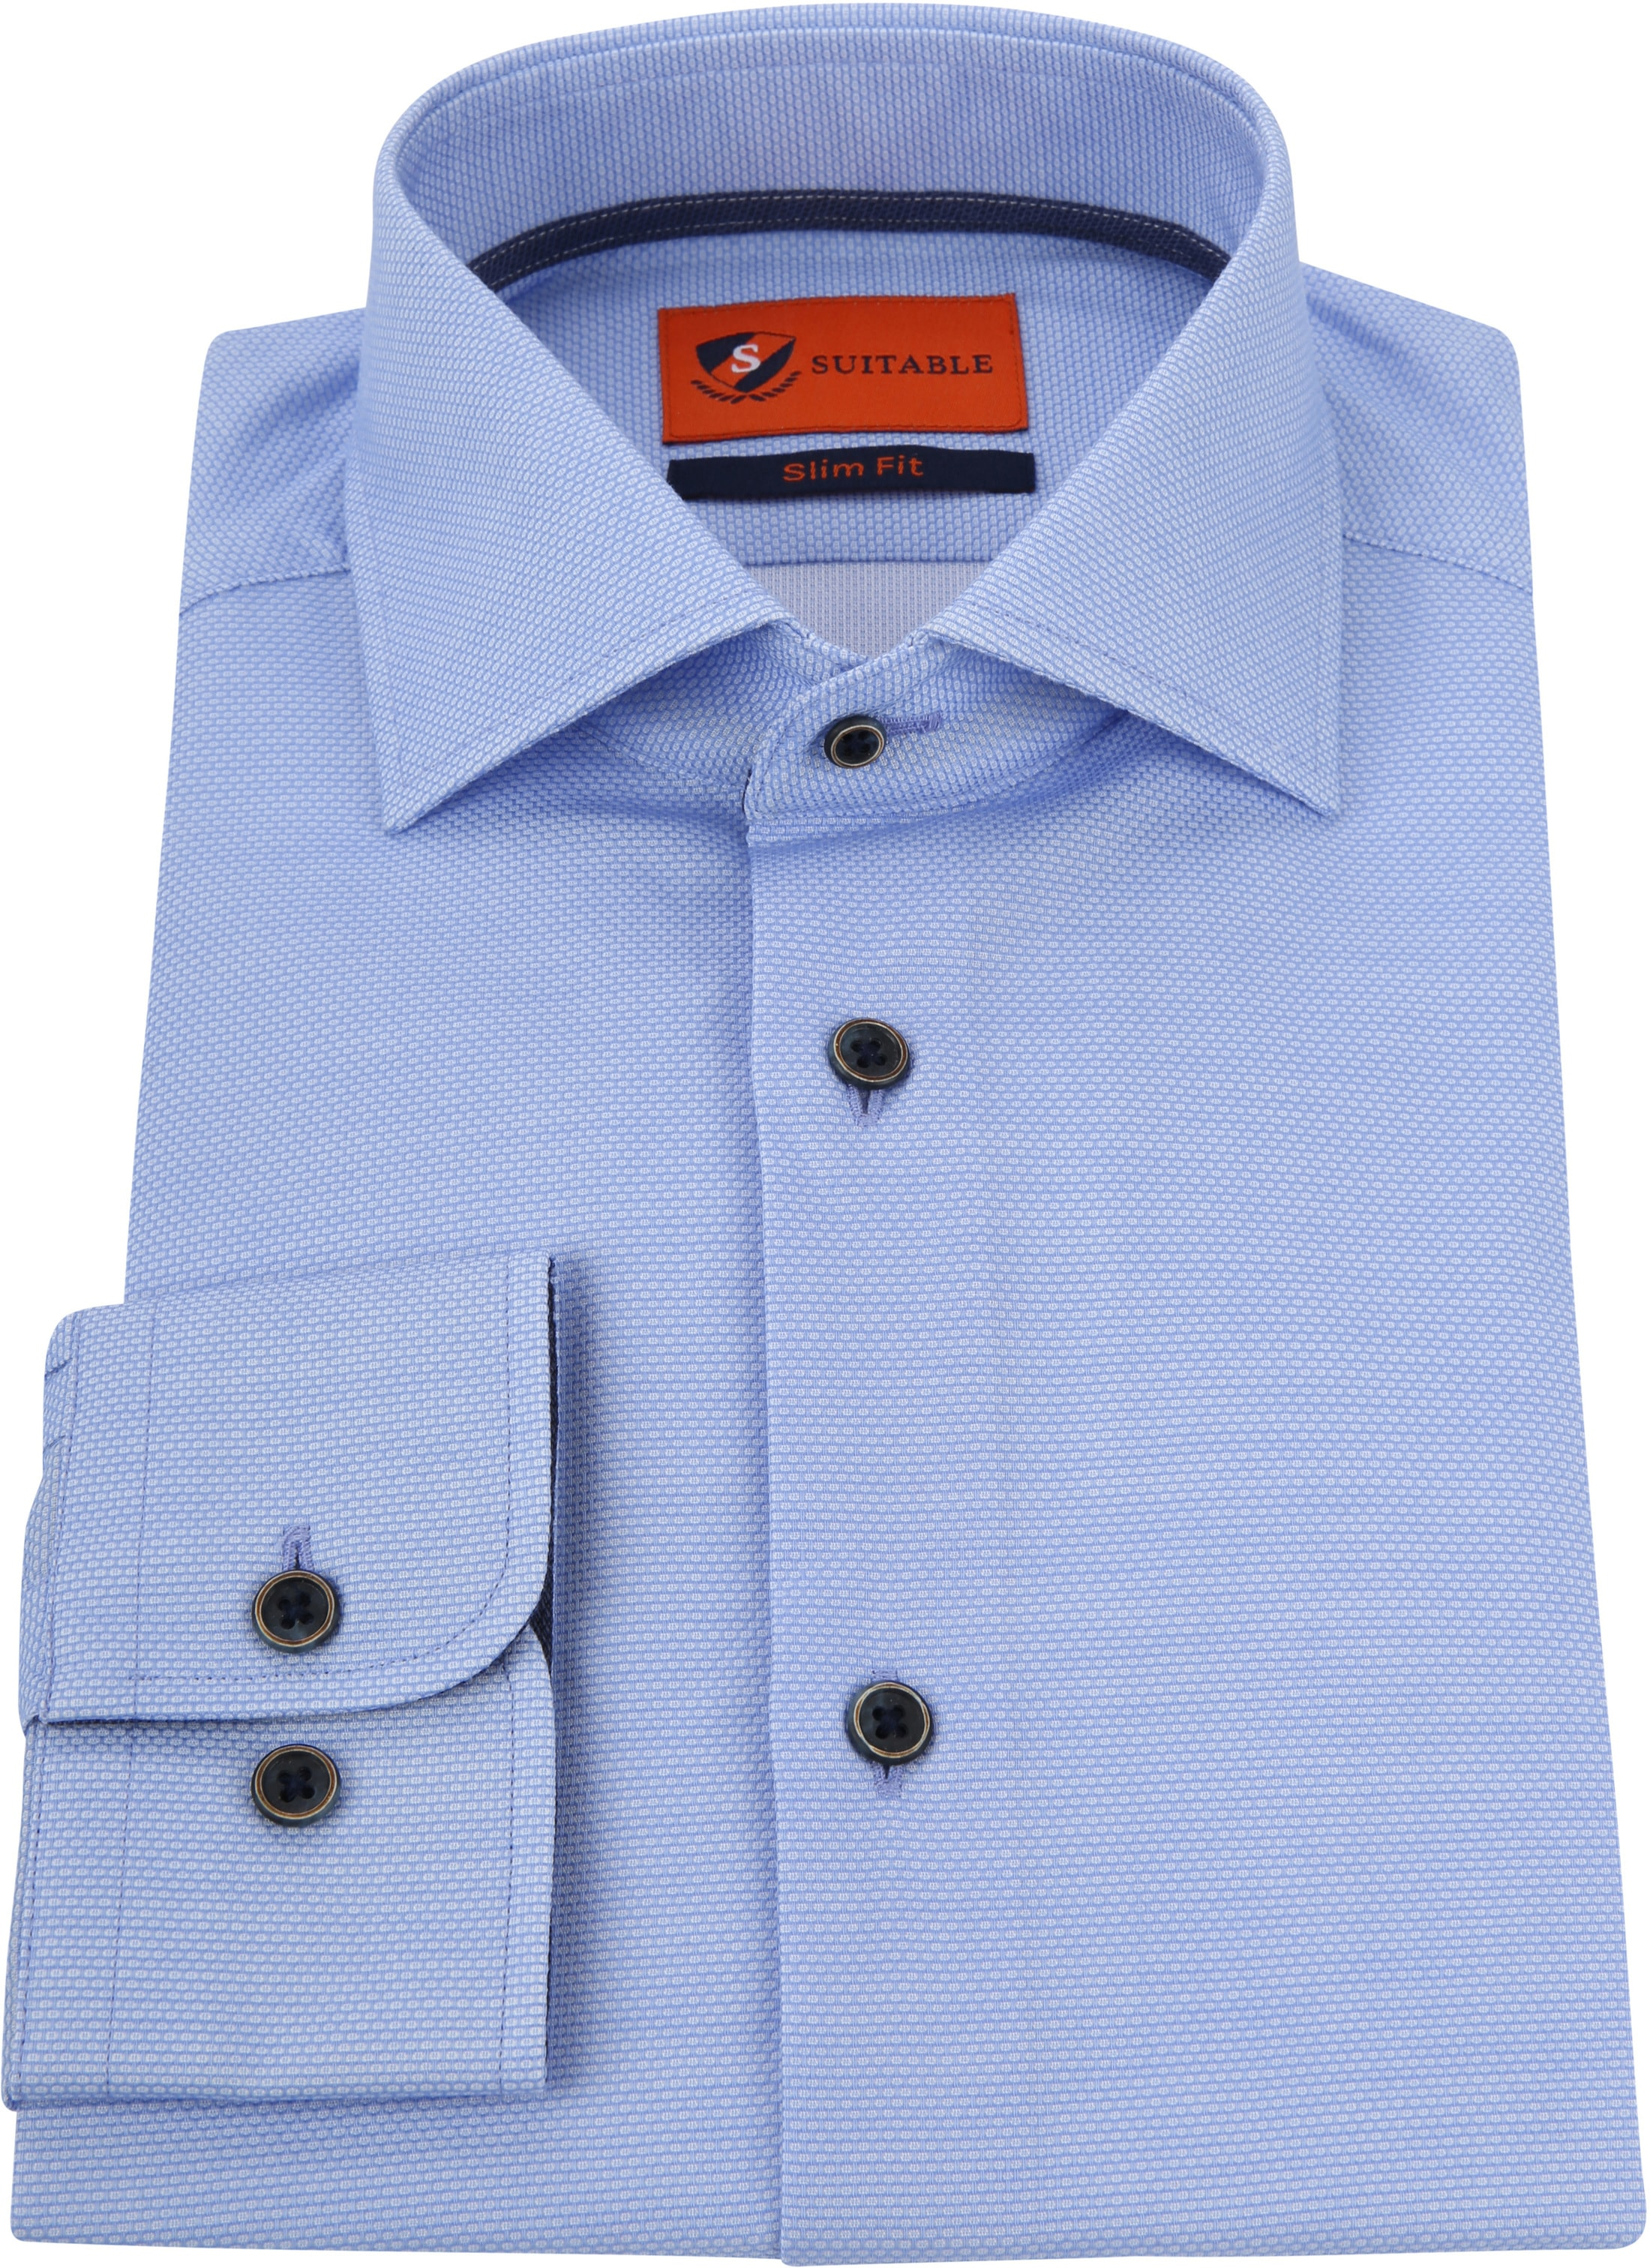 Suitable Overhemd Lichtblauw Waut foto 2